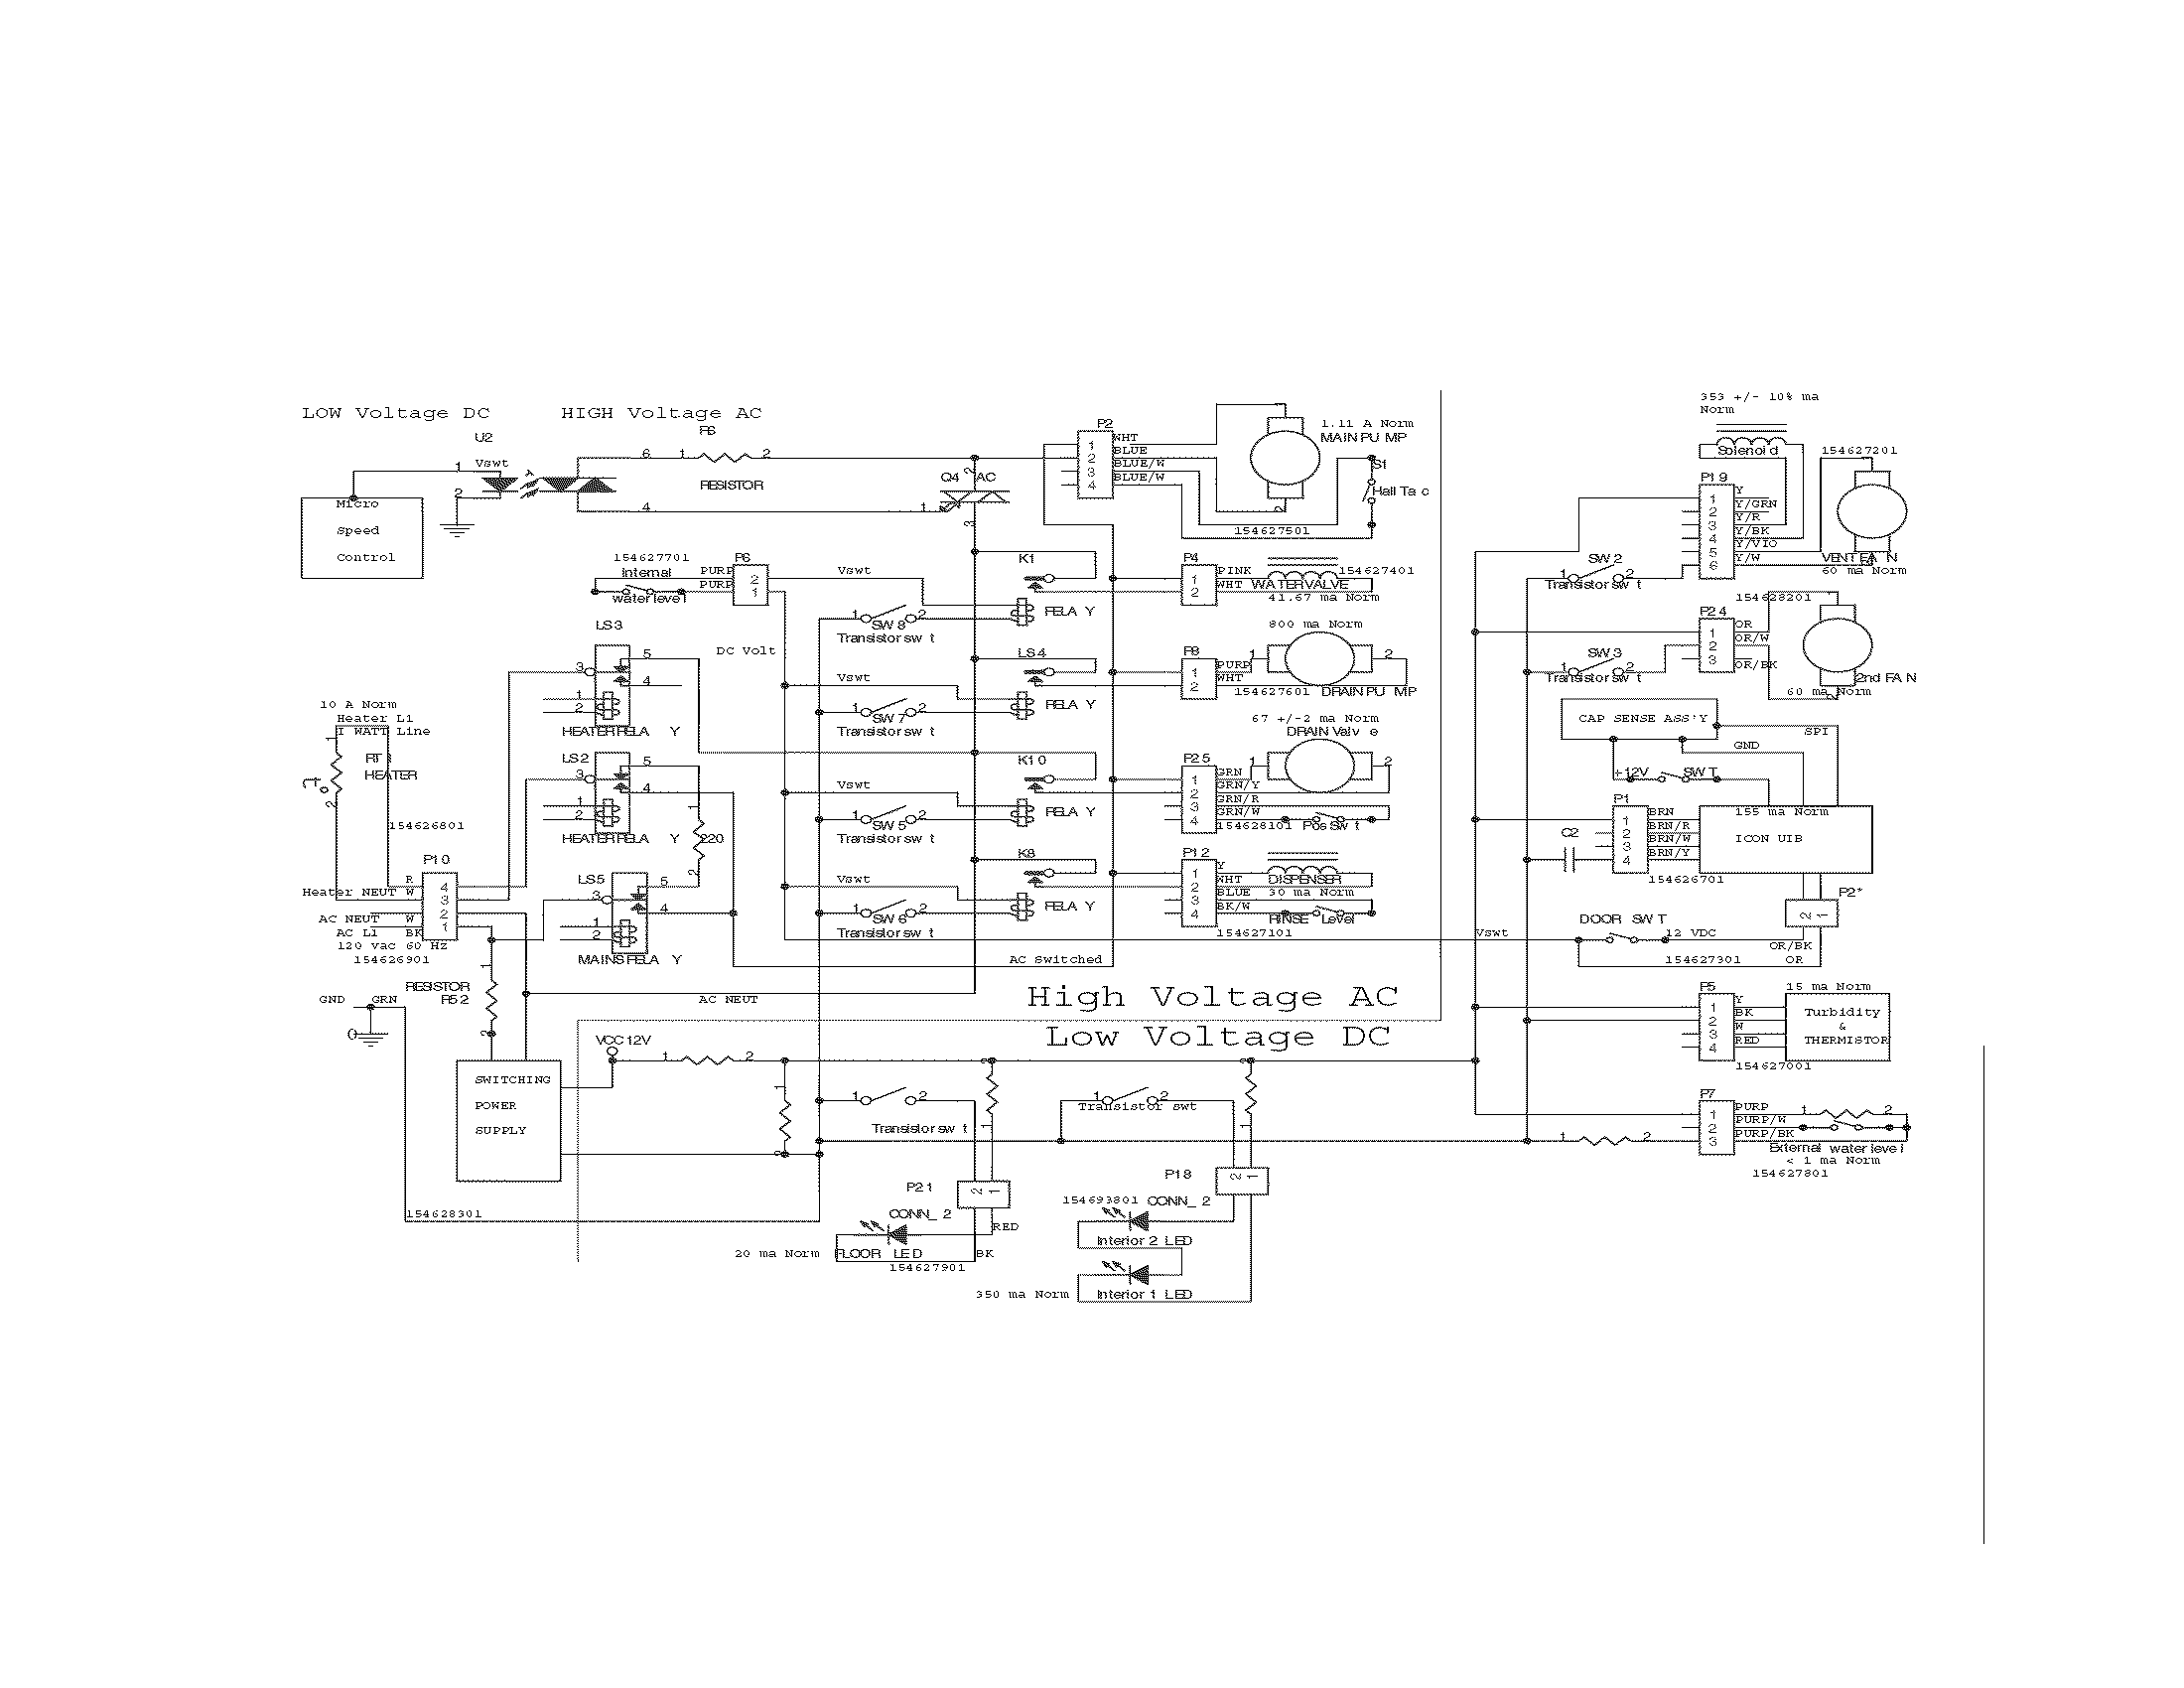 electrolux wiring diagram how to wire a plug dishwasher parts model edw7505hps1b sears